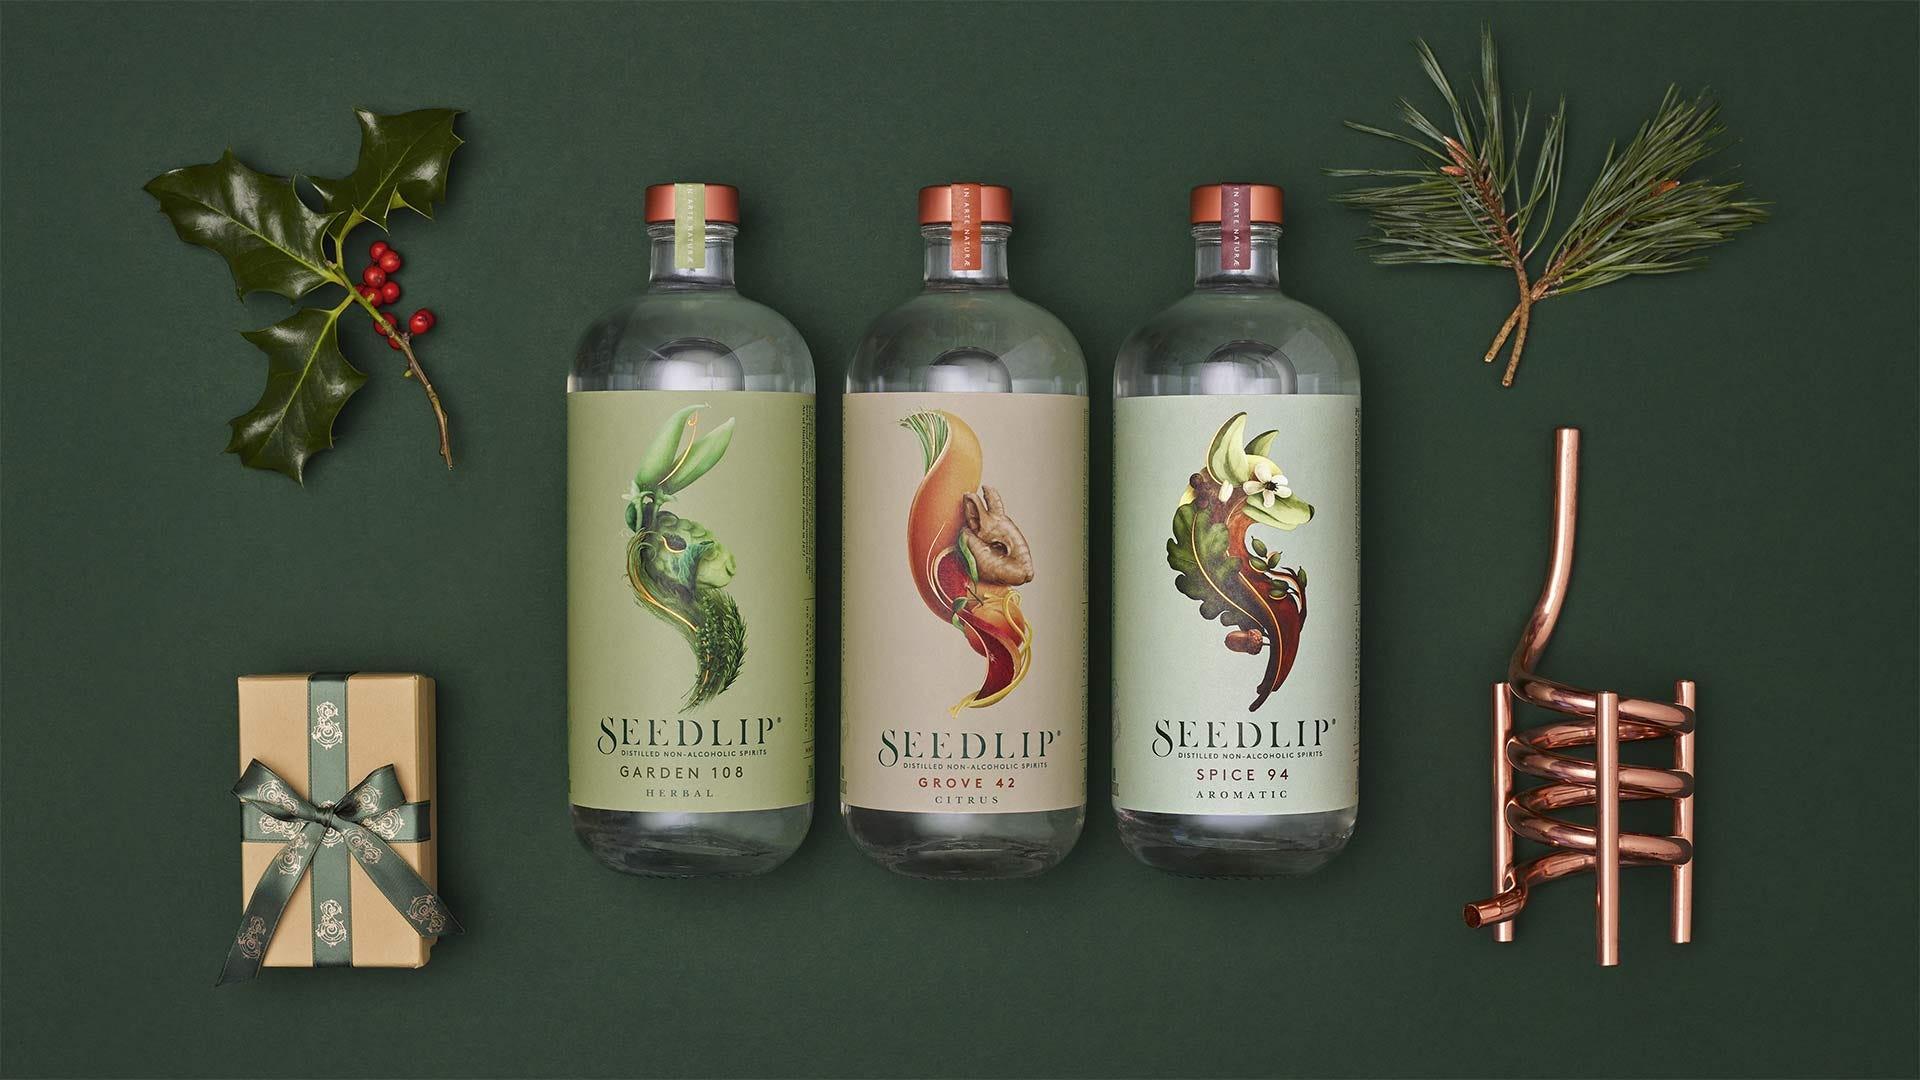 Various bottles of Seedlip non-alcoholic spirits.